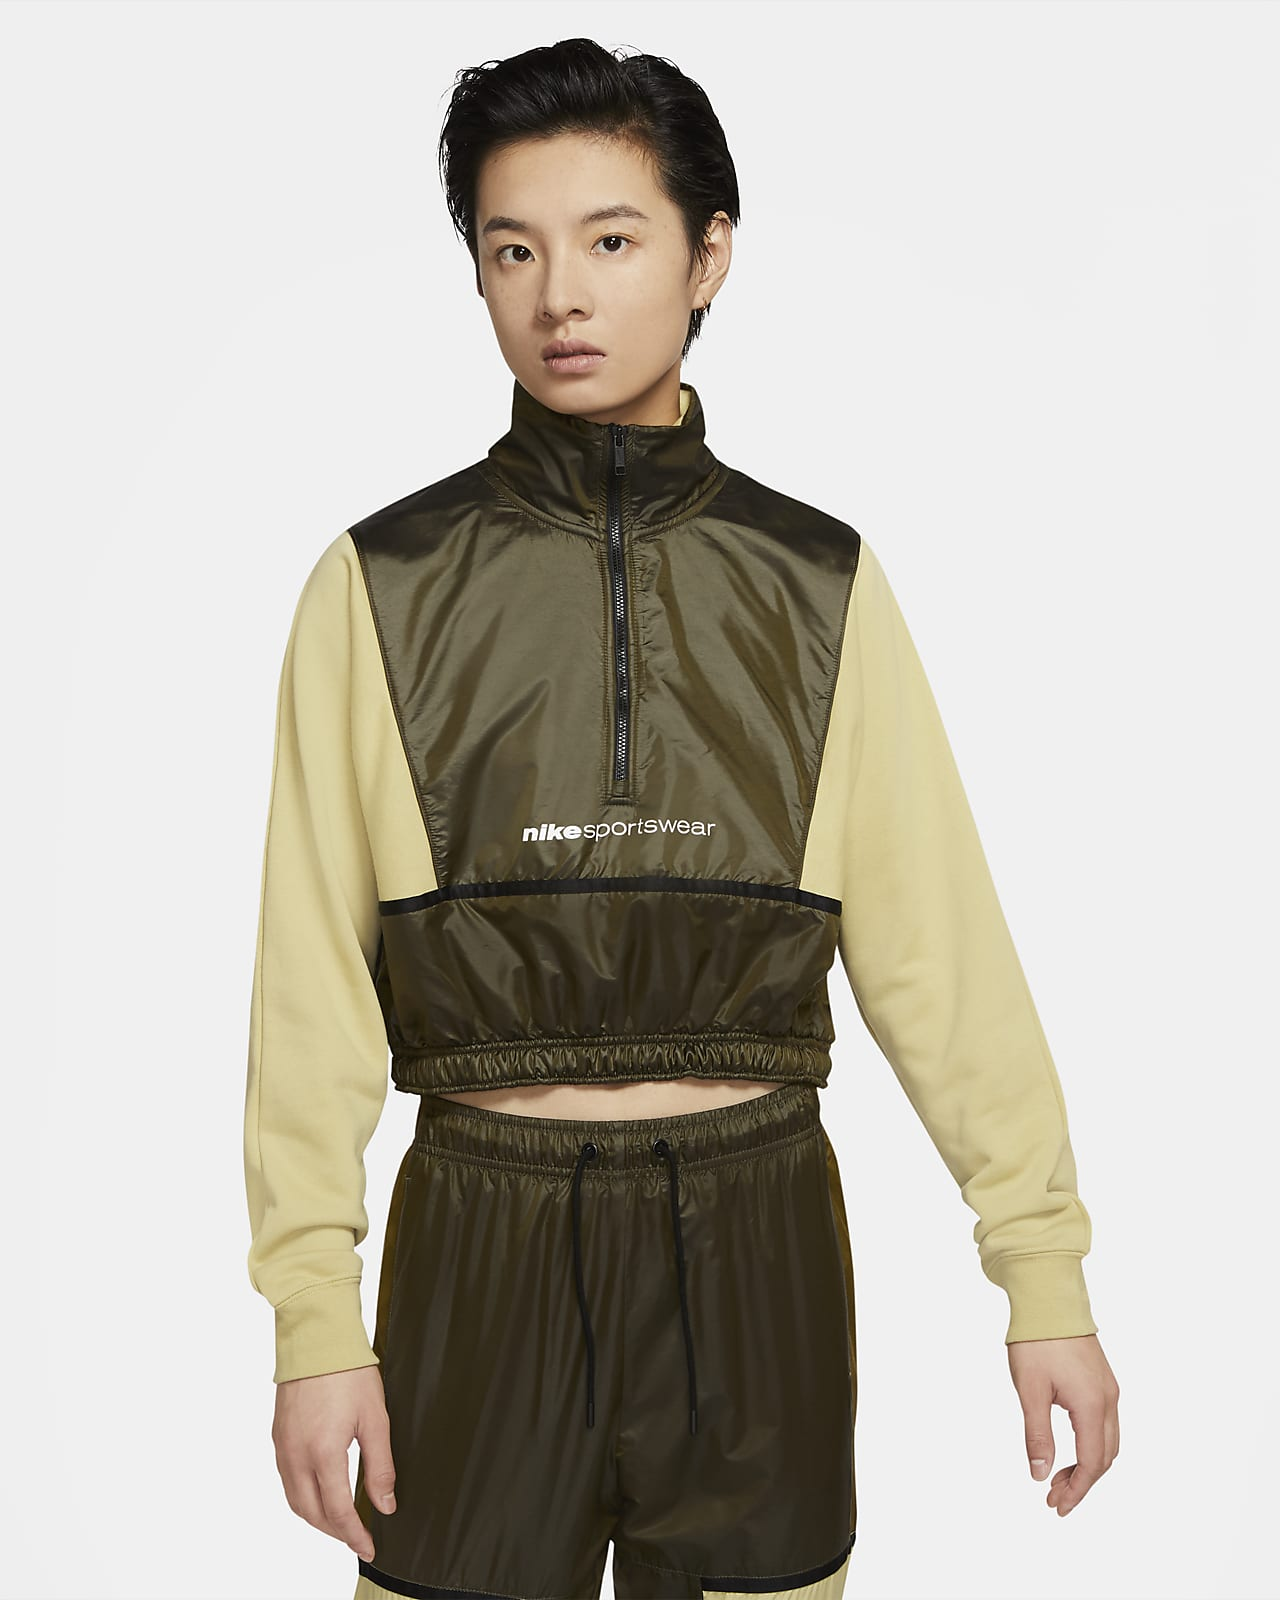 Nike Sportswear 女子 1/2 拉链开襟上衣